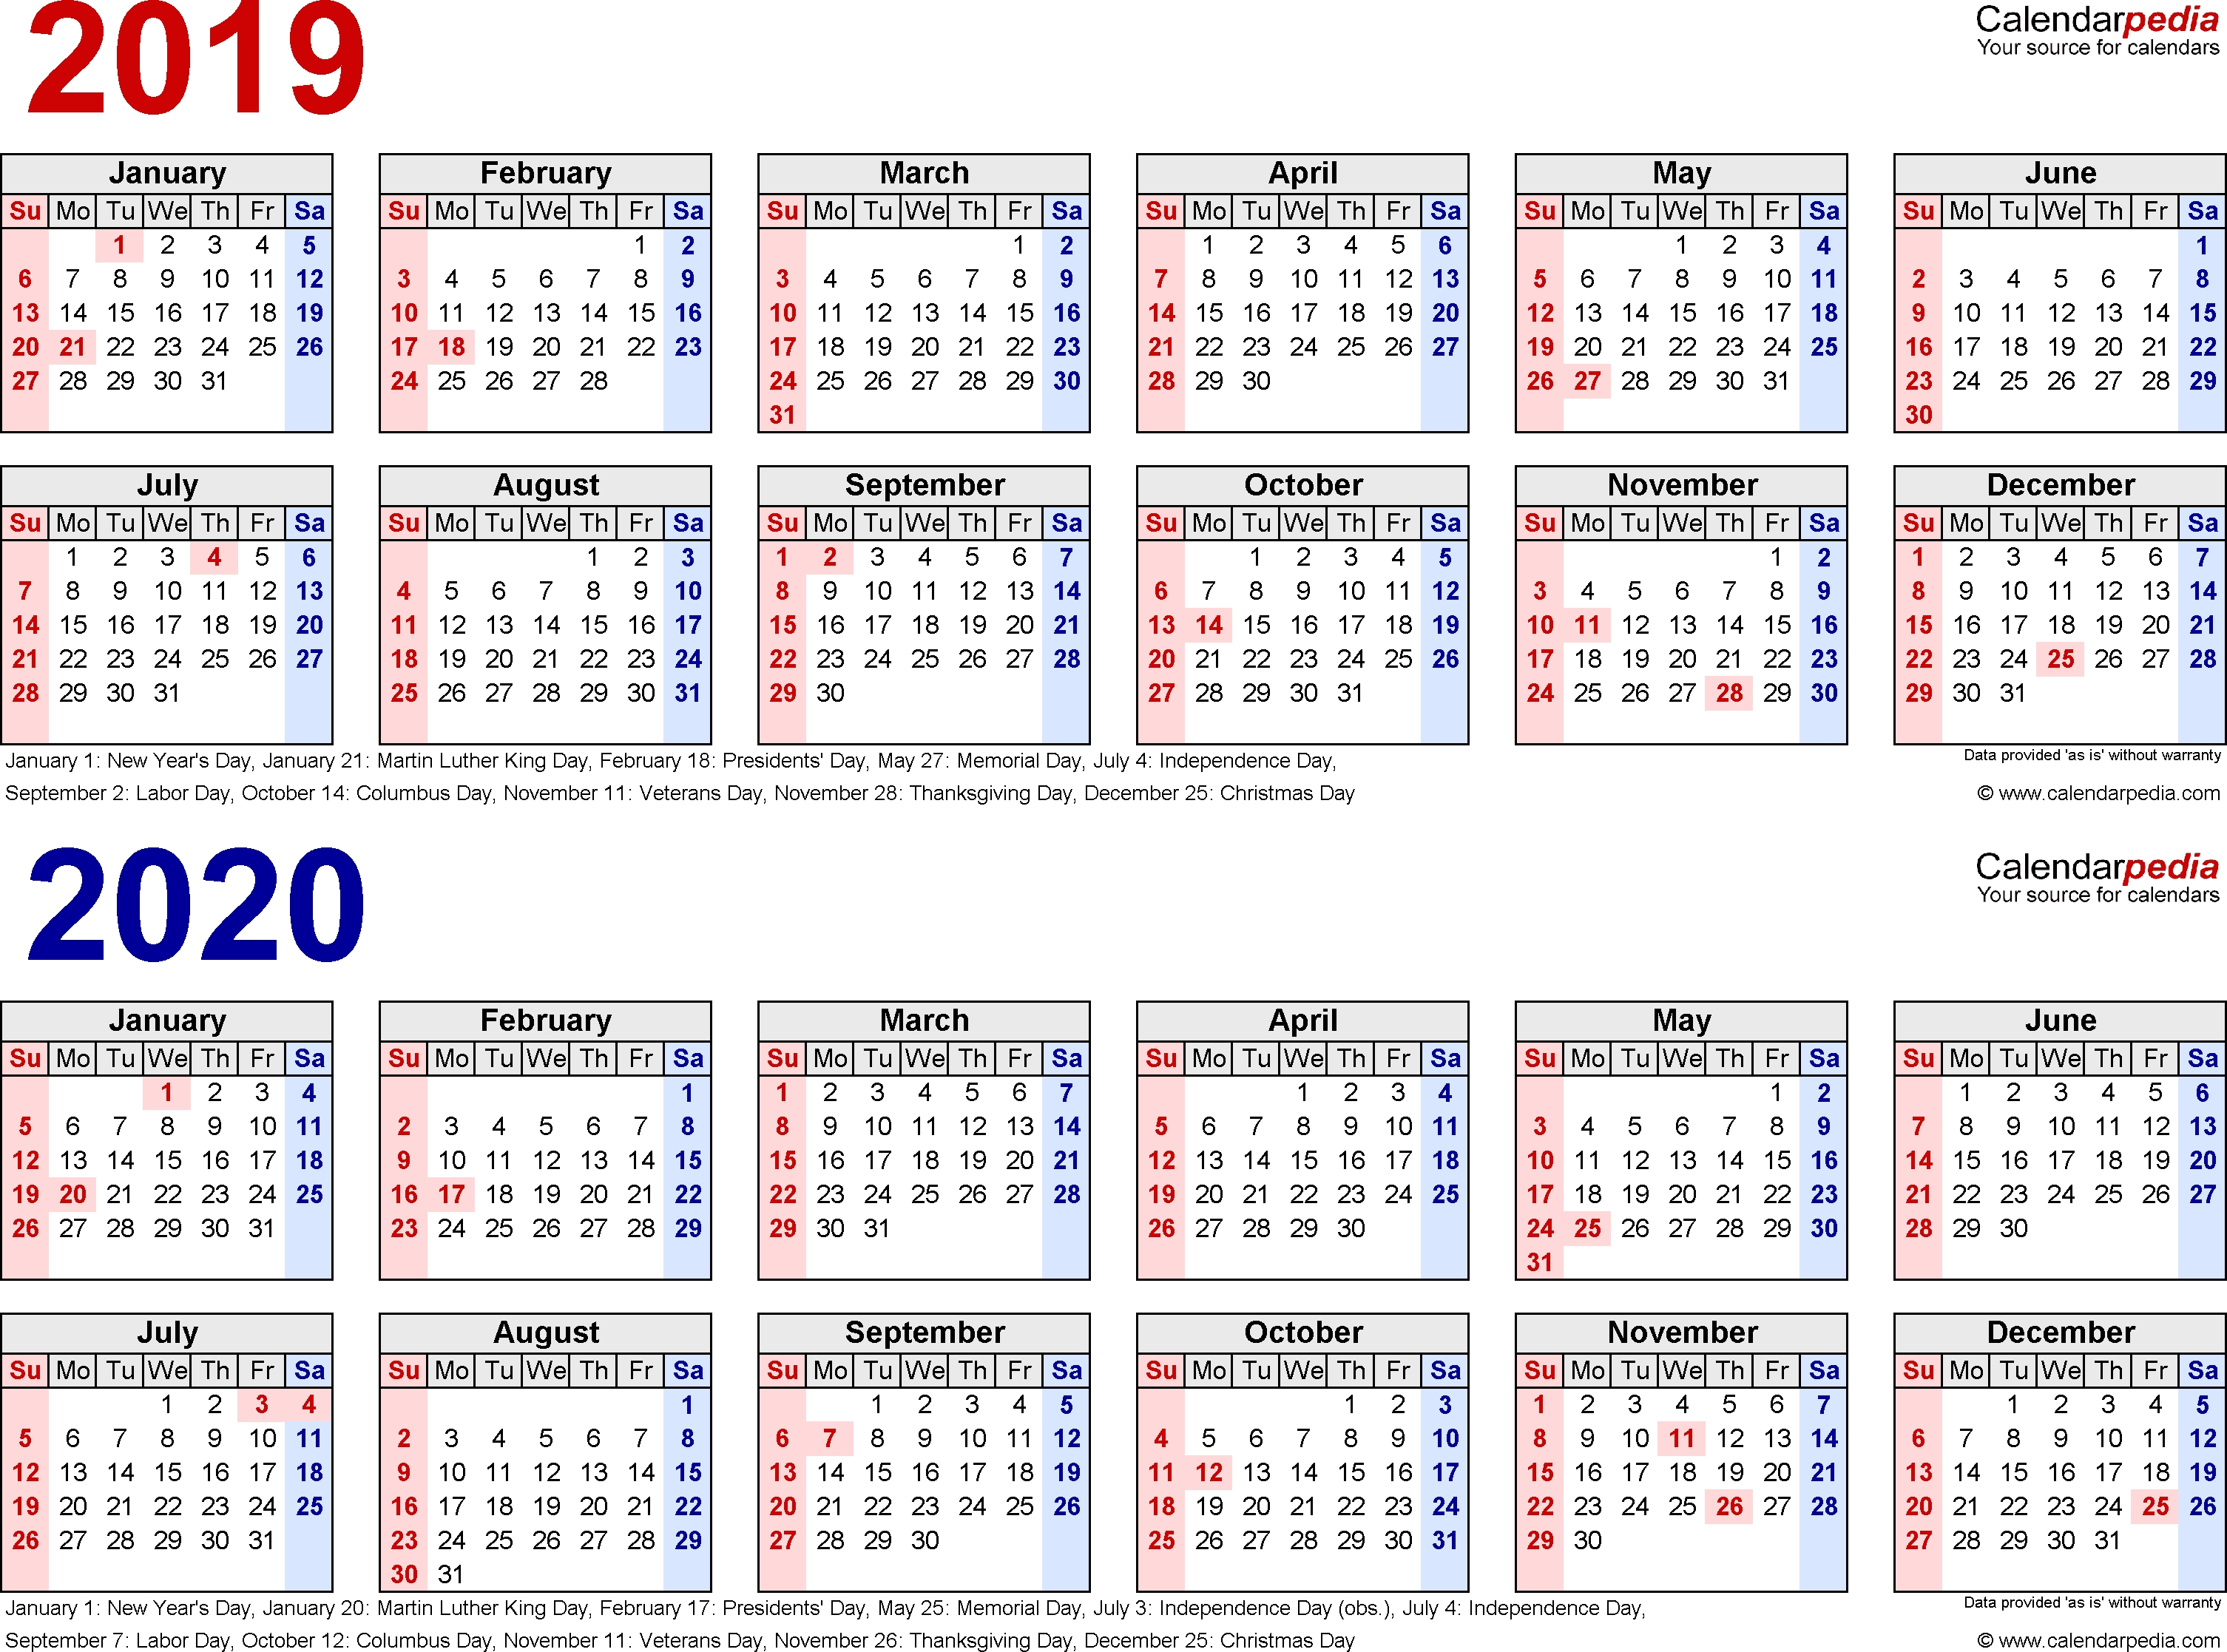 2019-2020 Calendar - Free Printable Two-Year Pdf Calendars throughout Free Printable Calendars 2019-2020 To Edit